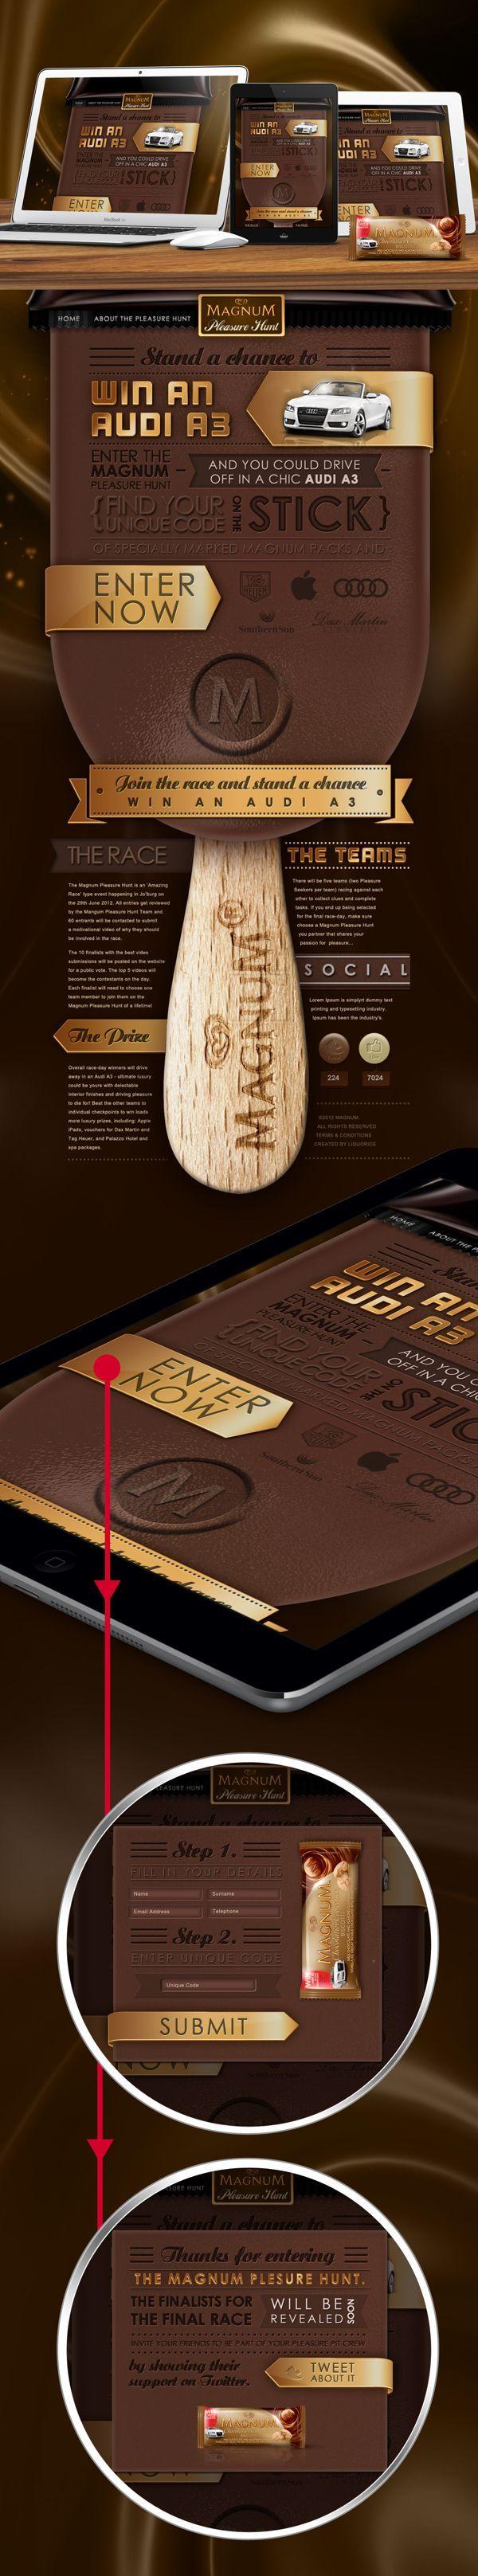 #websitedesign #webdesign #webtemplate #magnum #walls #icecream